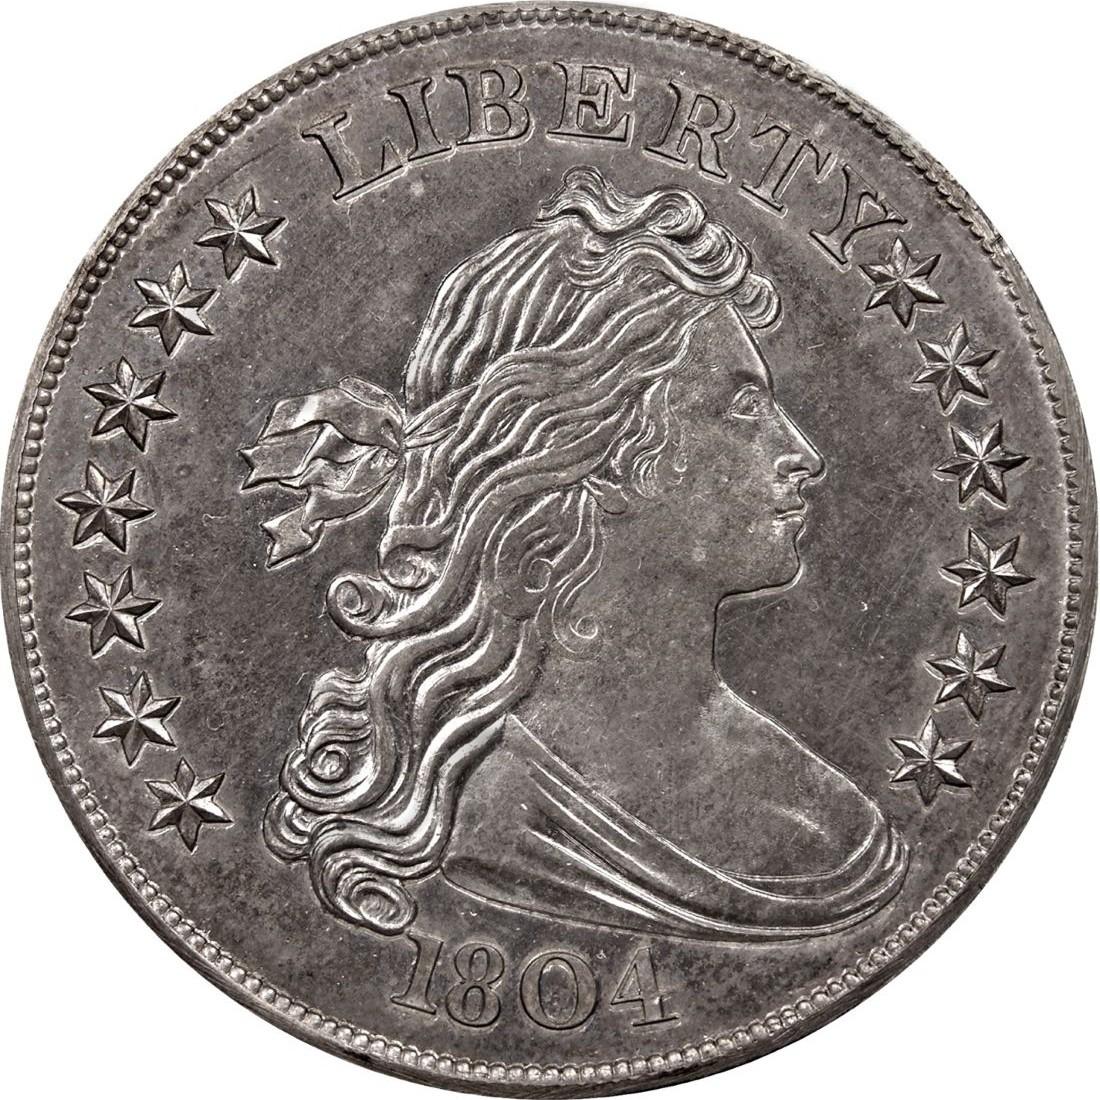 1804 liberty coin